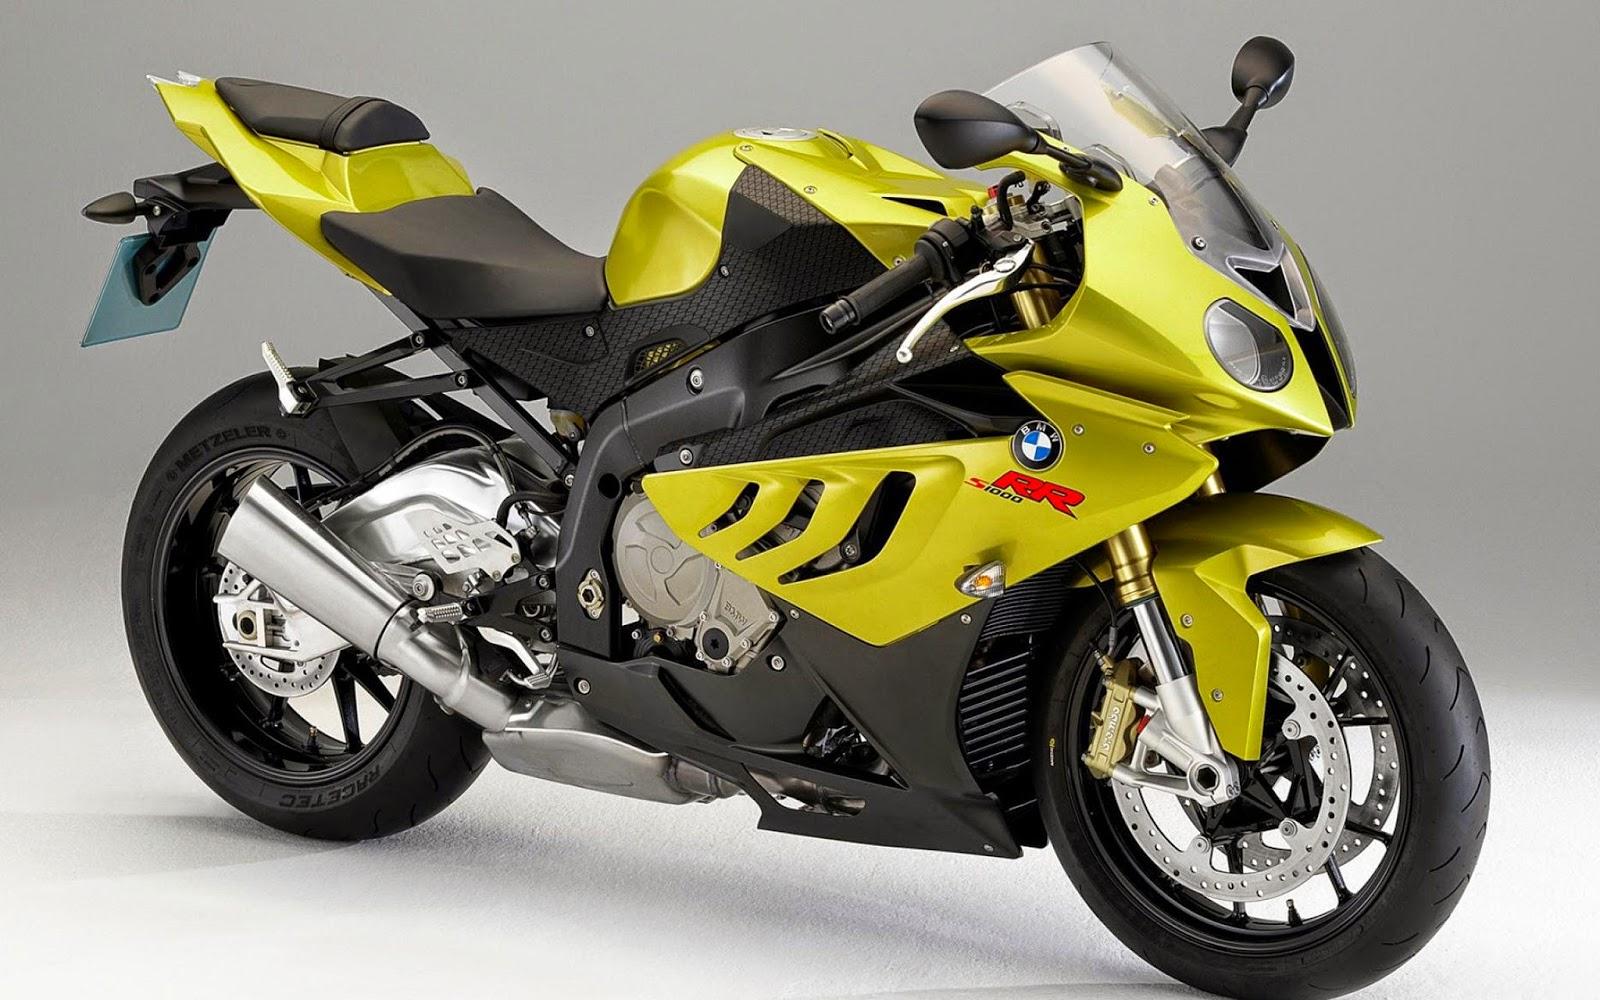 Bmw Yellow Very Successful Stylish Bike Great Looks